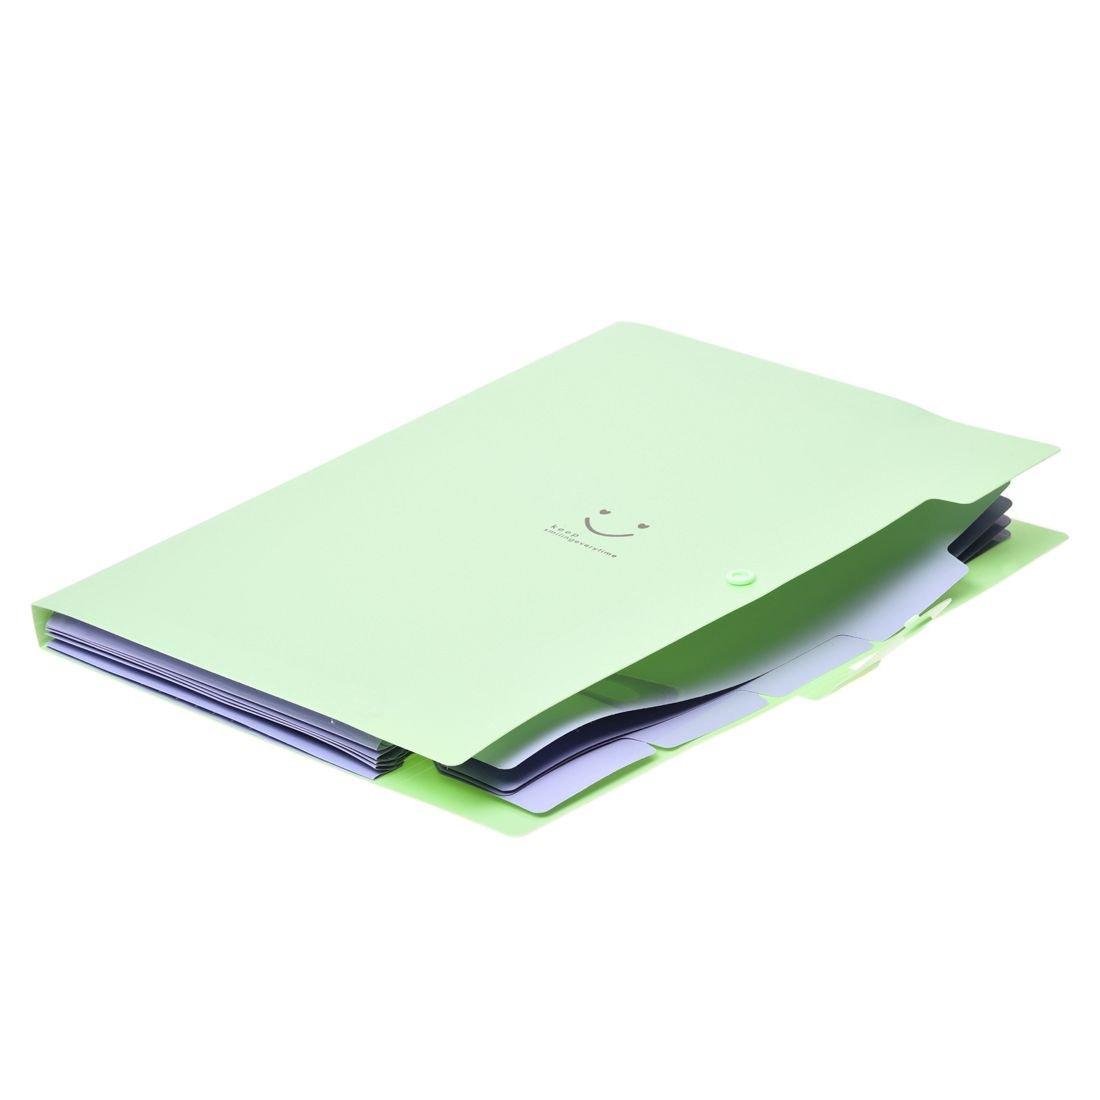 Amazon.com : SODIAL(R) Kawaii FoldersStationery Carpeta File Folder 5layers Archivadores Rings A4 Document Bag Office Carpetas£¨Light Green£ : Office ...